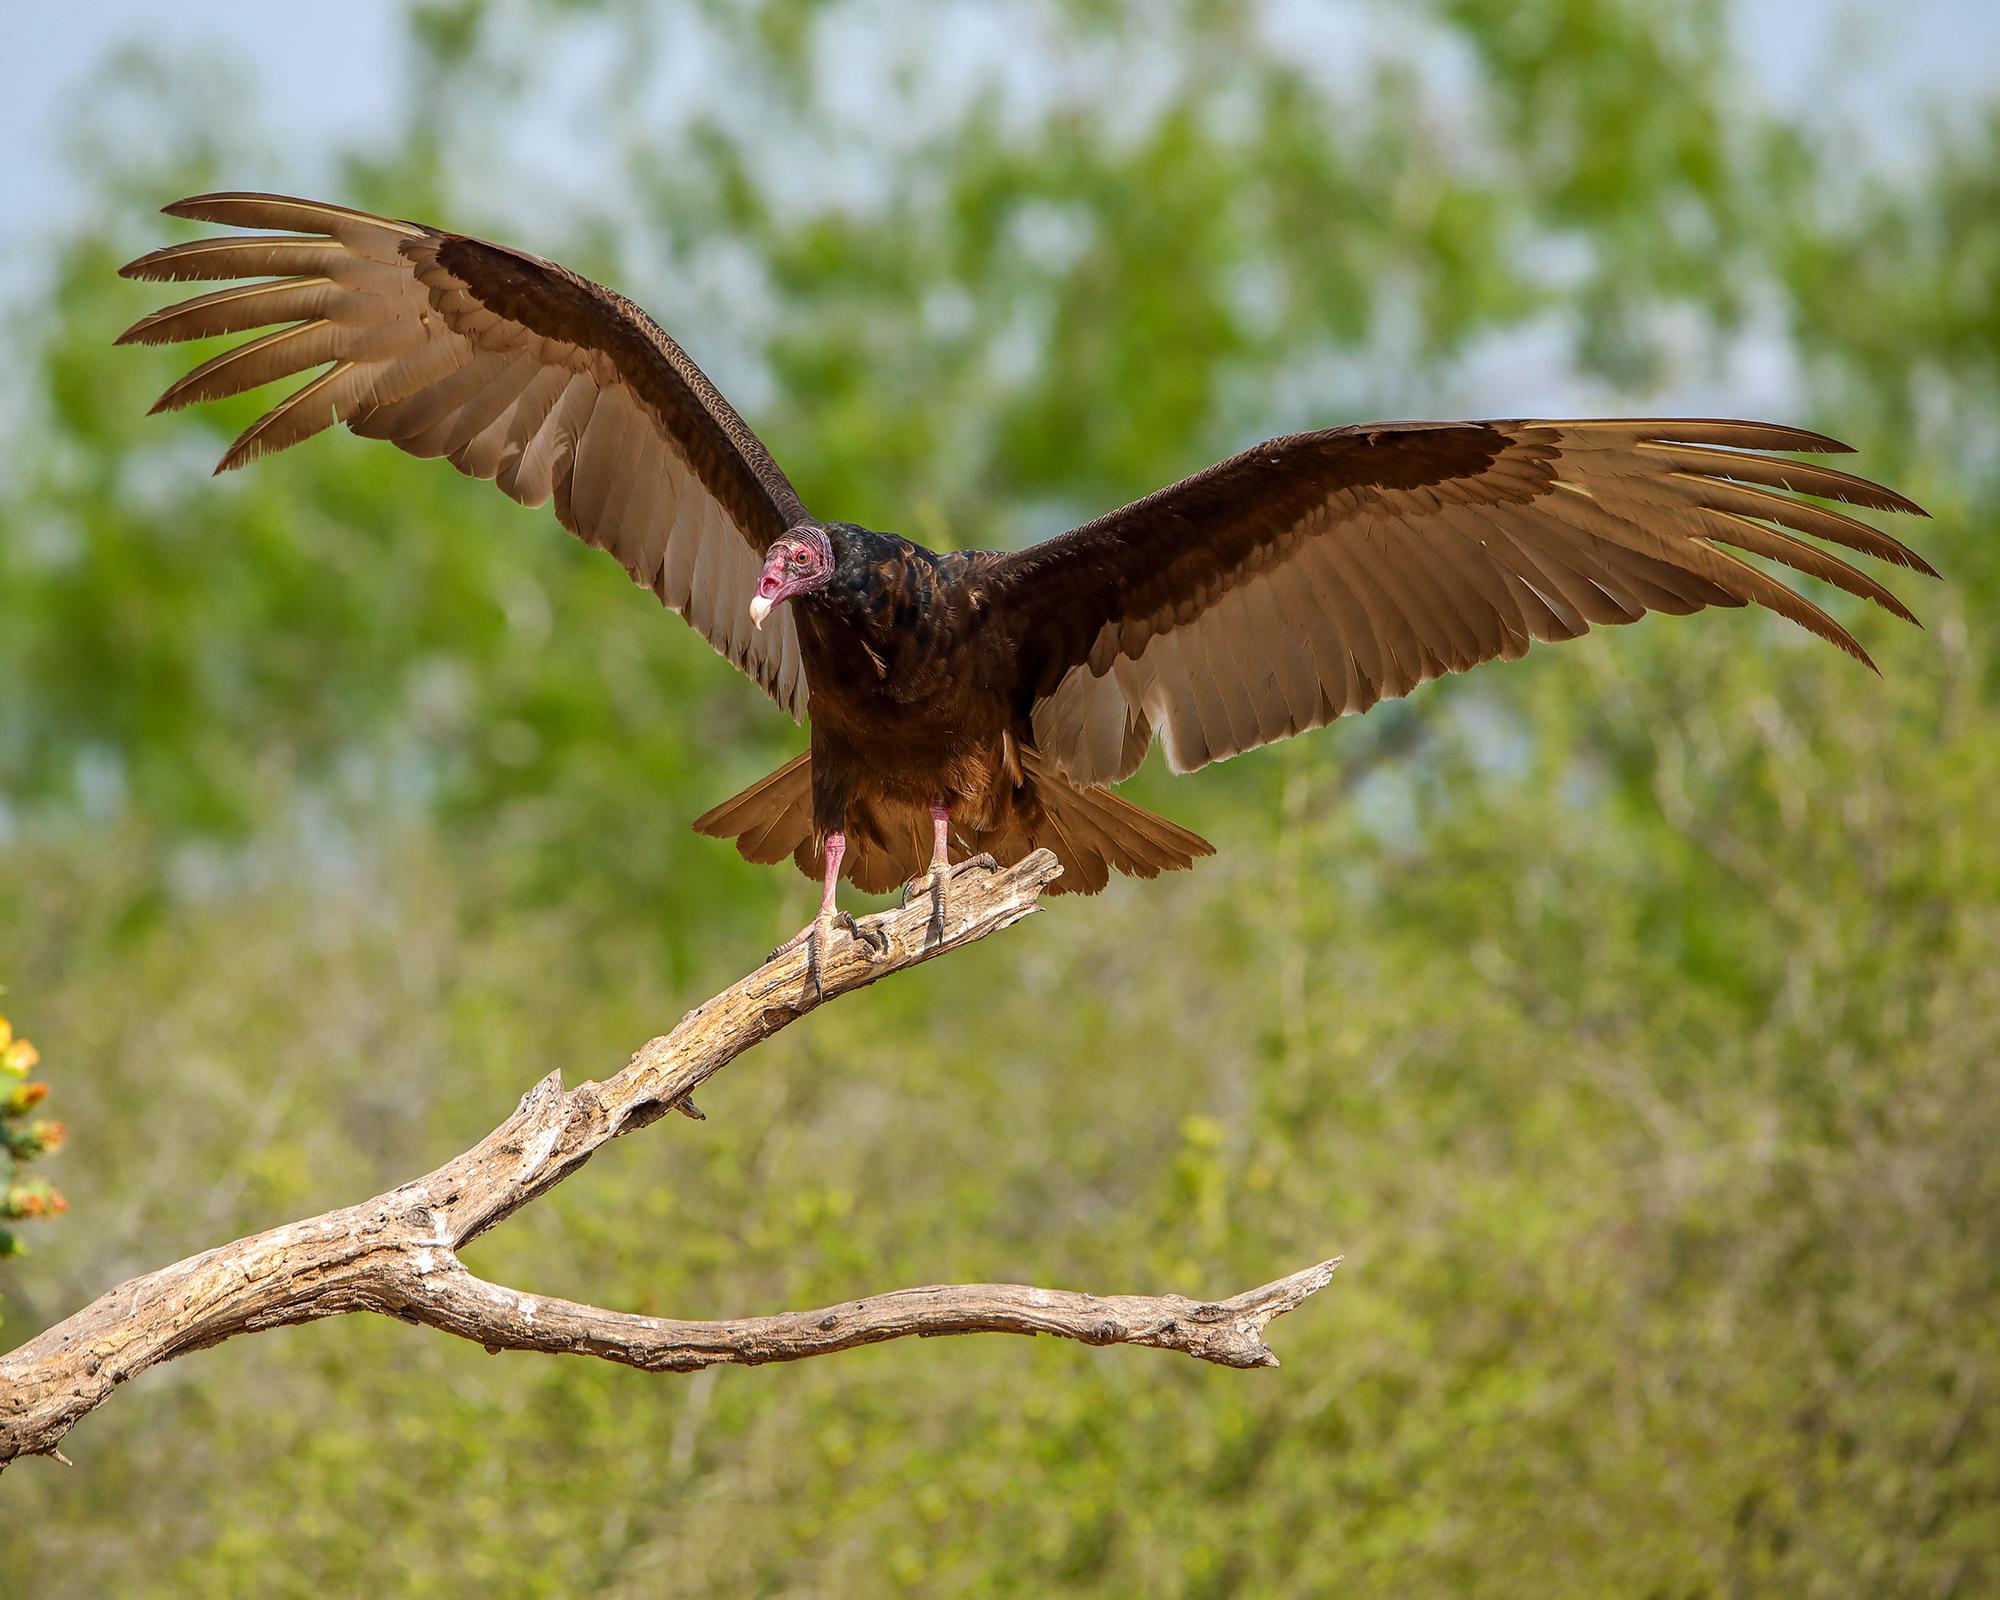 10. Turkey Vulture off Martin Refuge, Mission, Texas